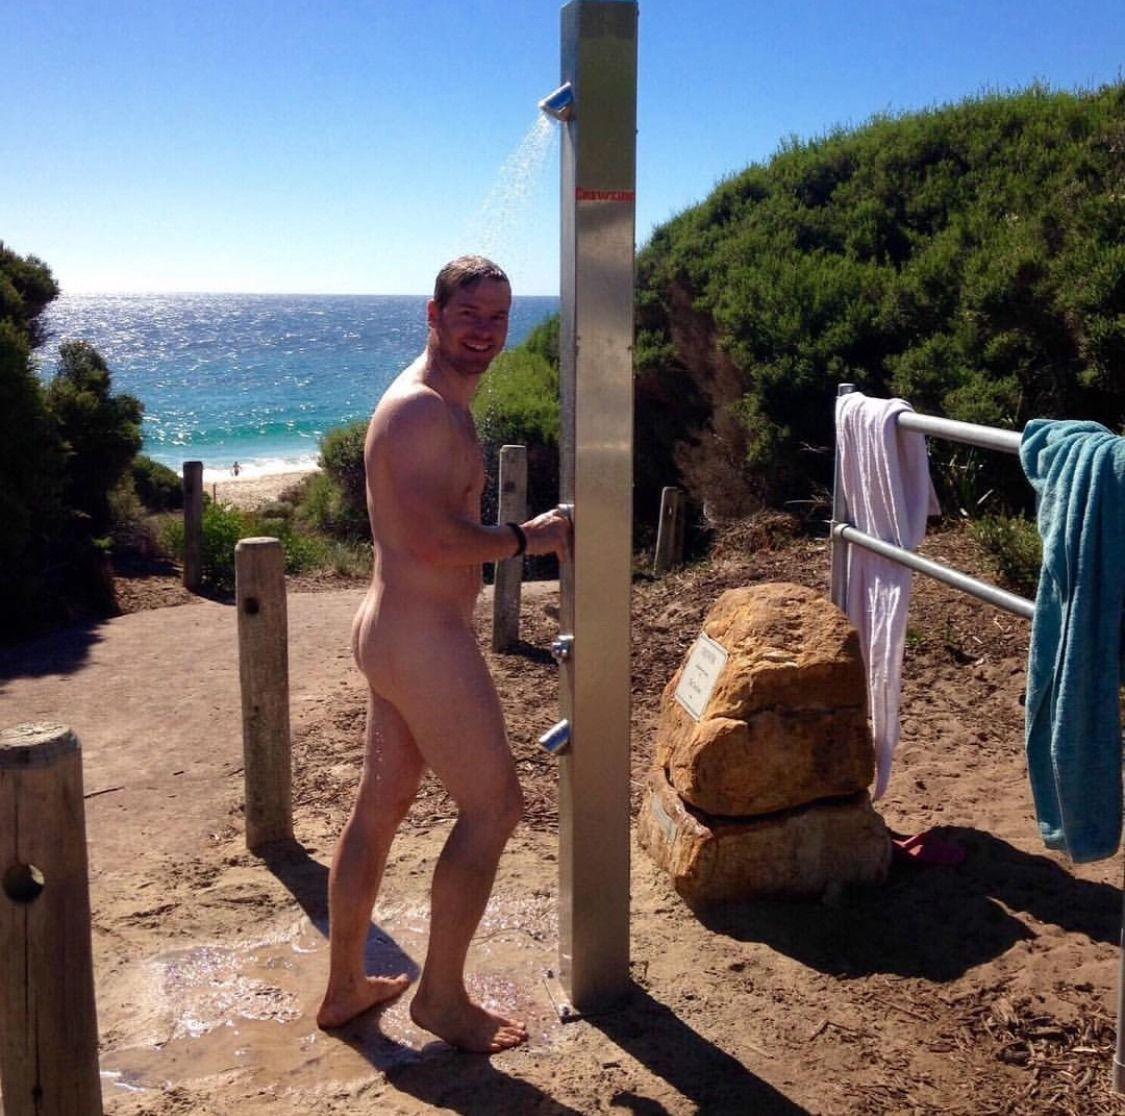 Beach alomg nude nude with you